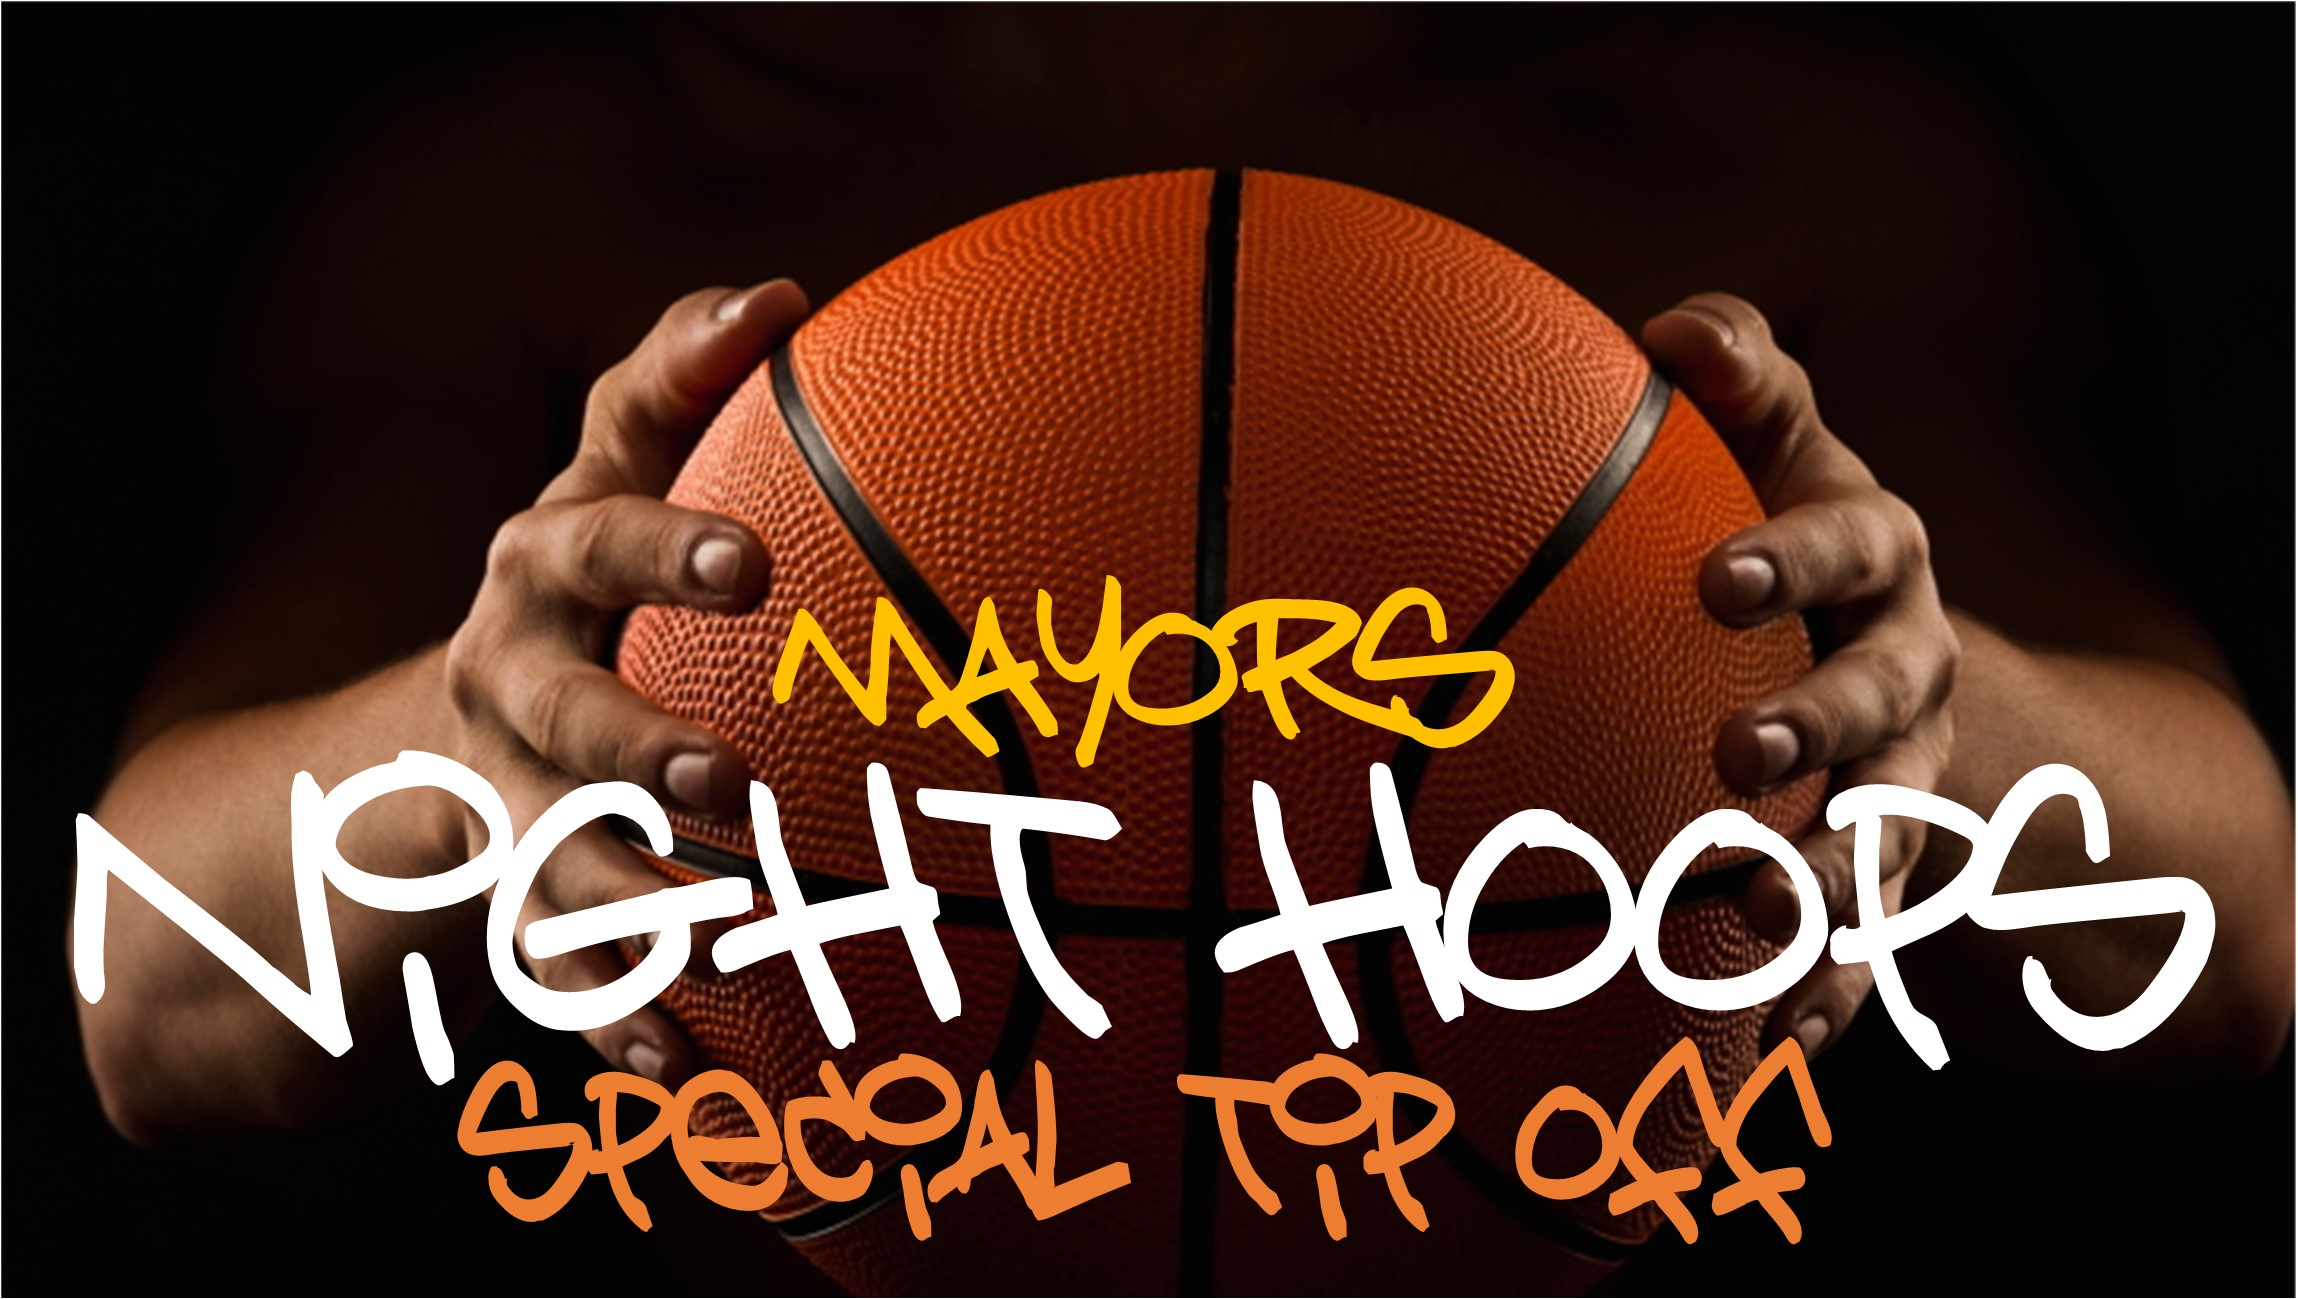 Mayor's Nights Hoops Special Tip-Off